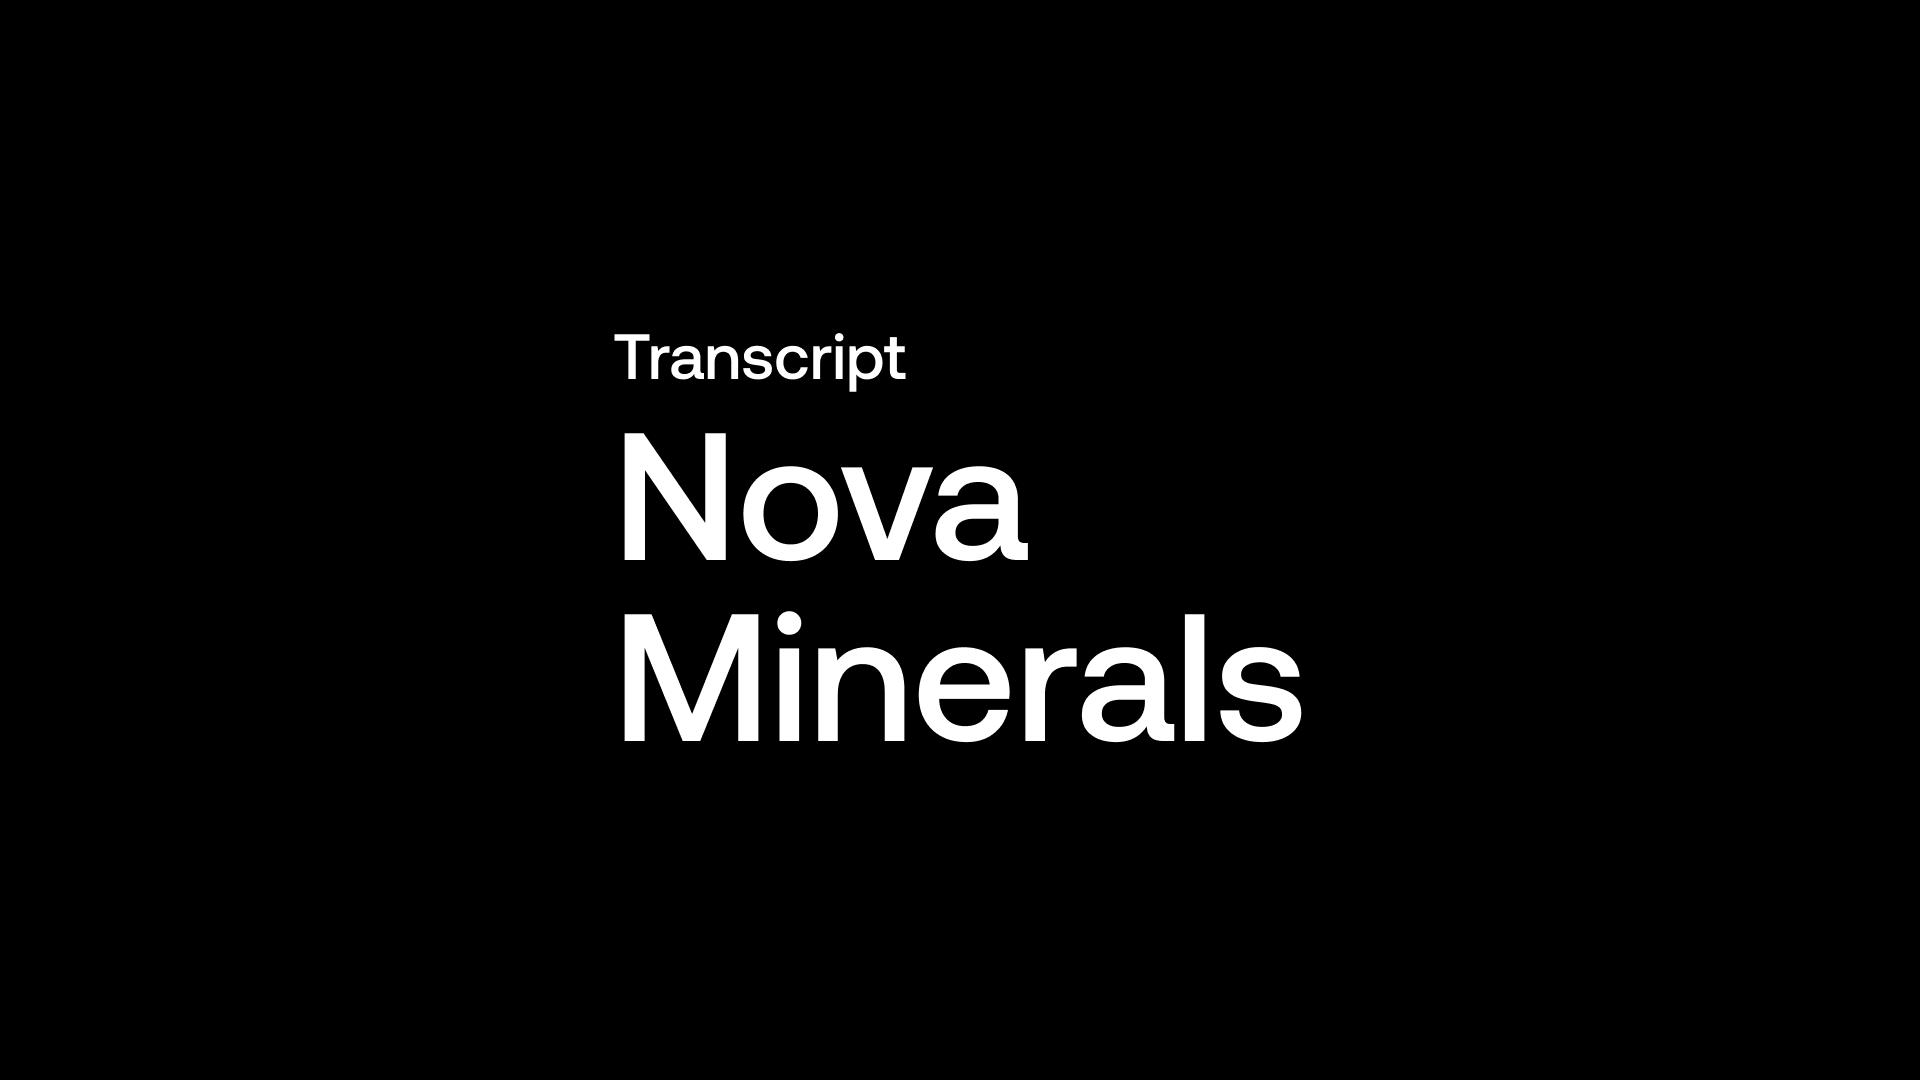 Transcript: Nova Minerals (NVA) - $20M In Bank & 50,000m Drilling to Come